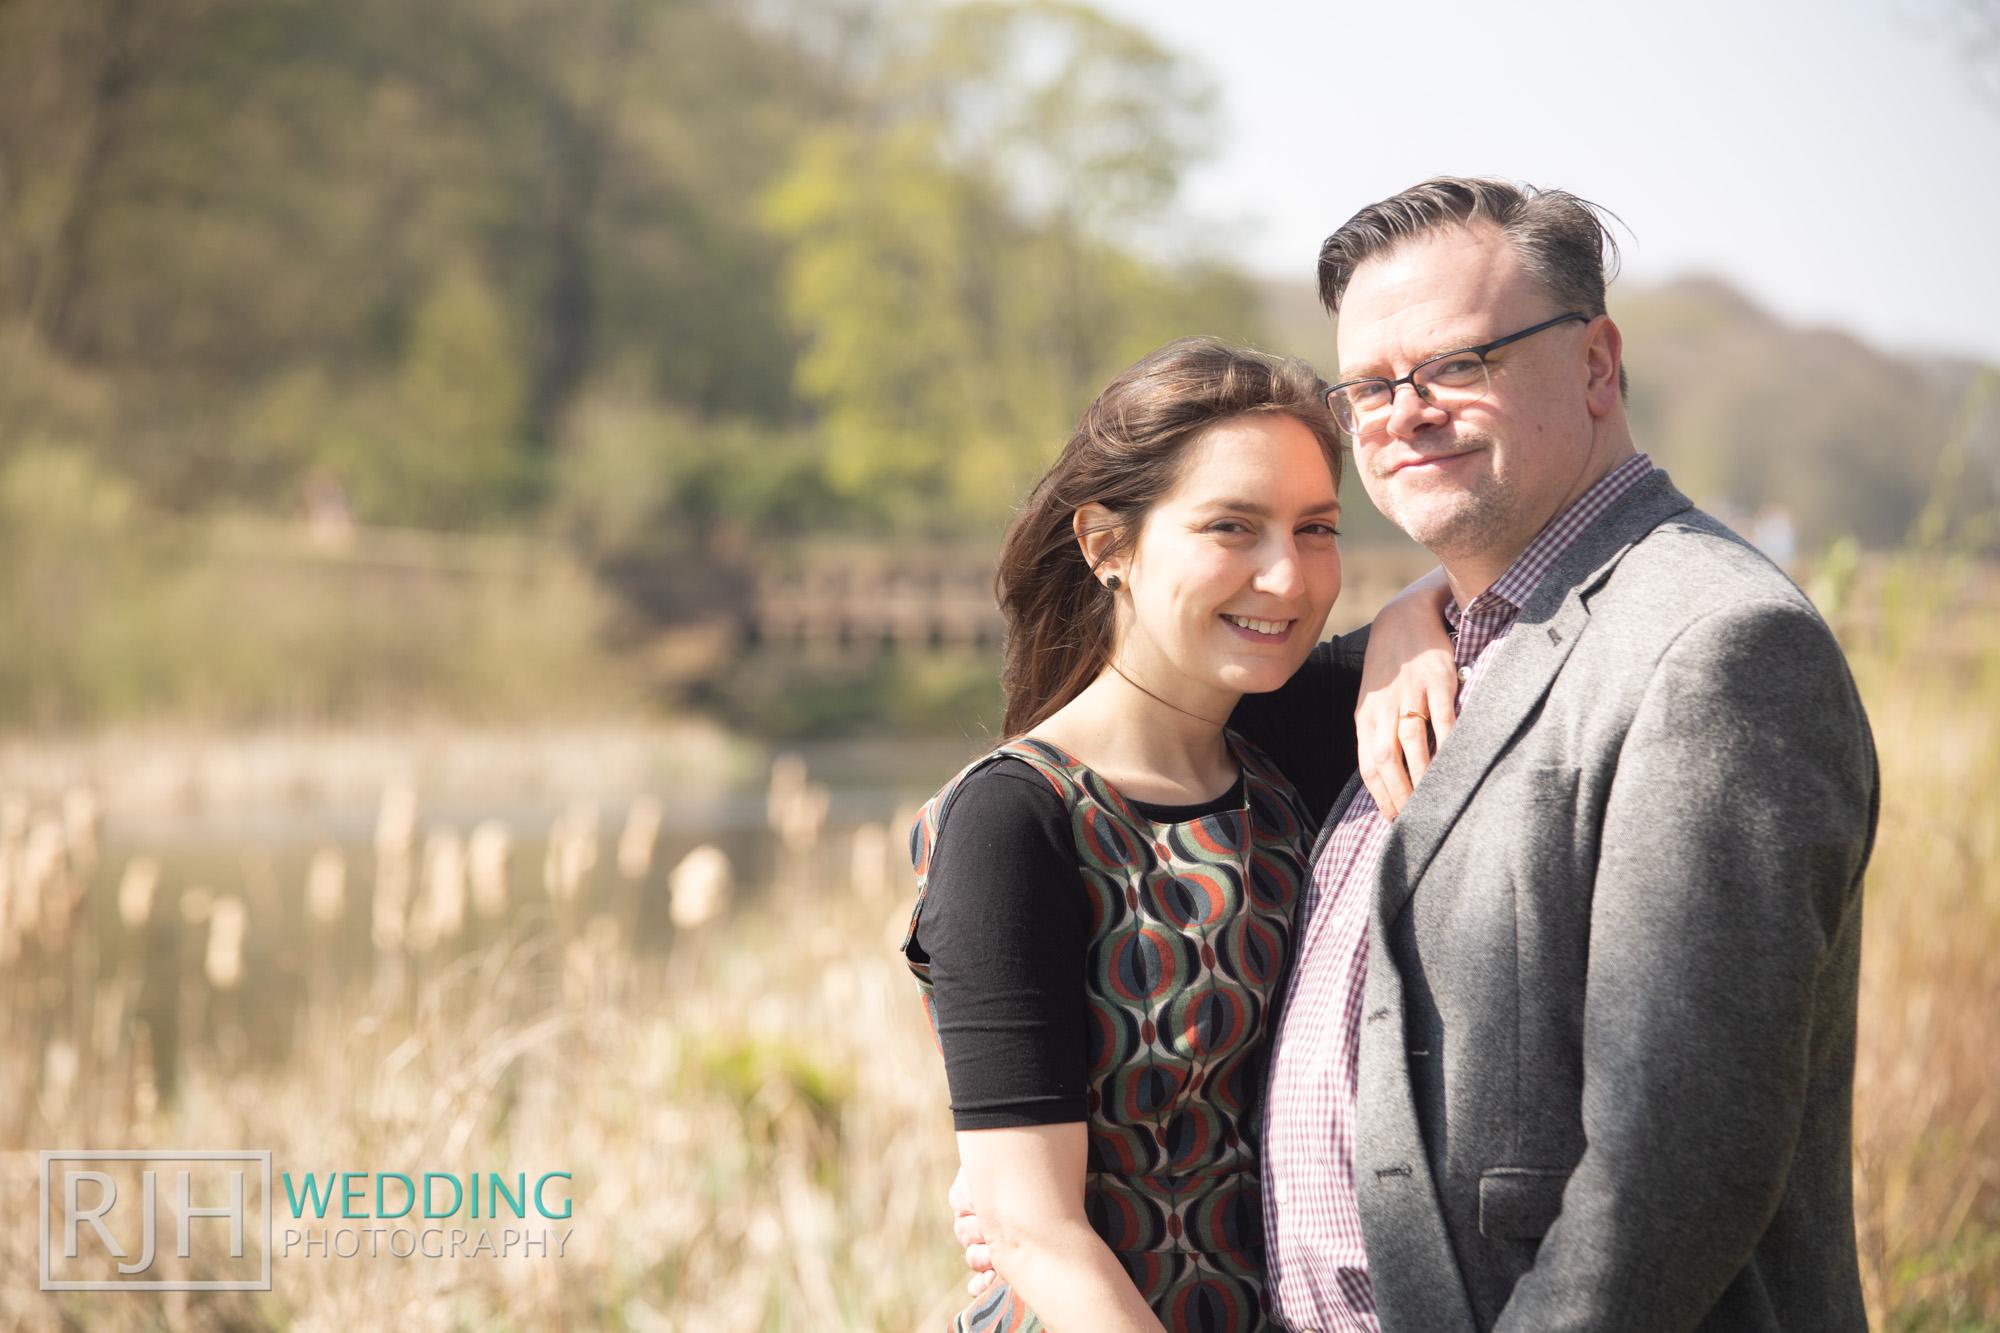 Pre-wedding photography - Richard & Rachel_017_3C2A8212.jpg